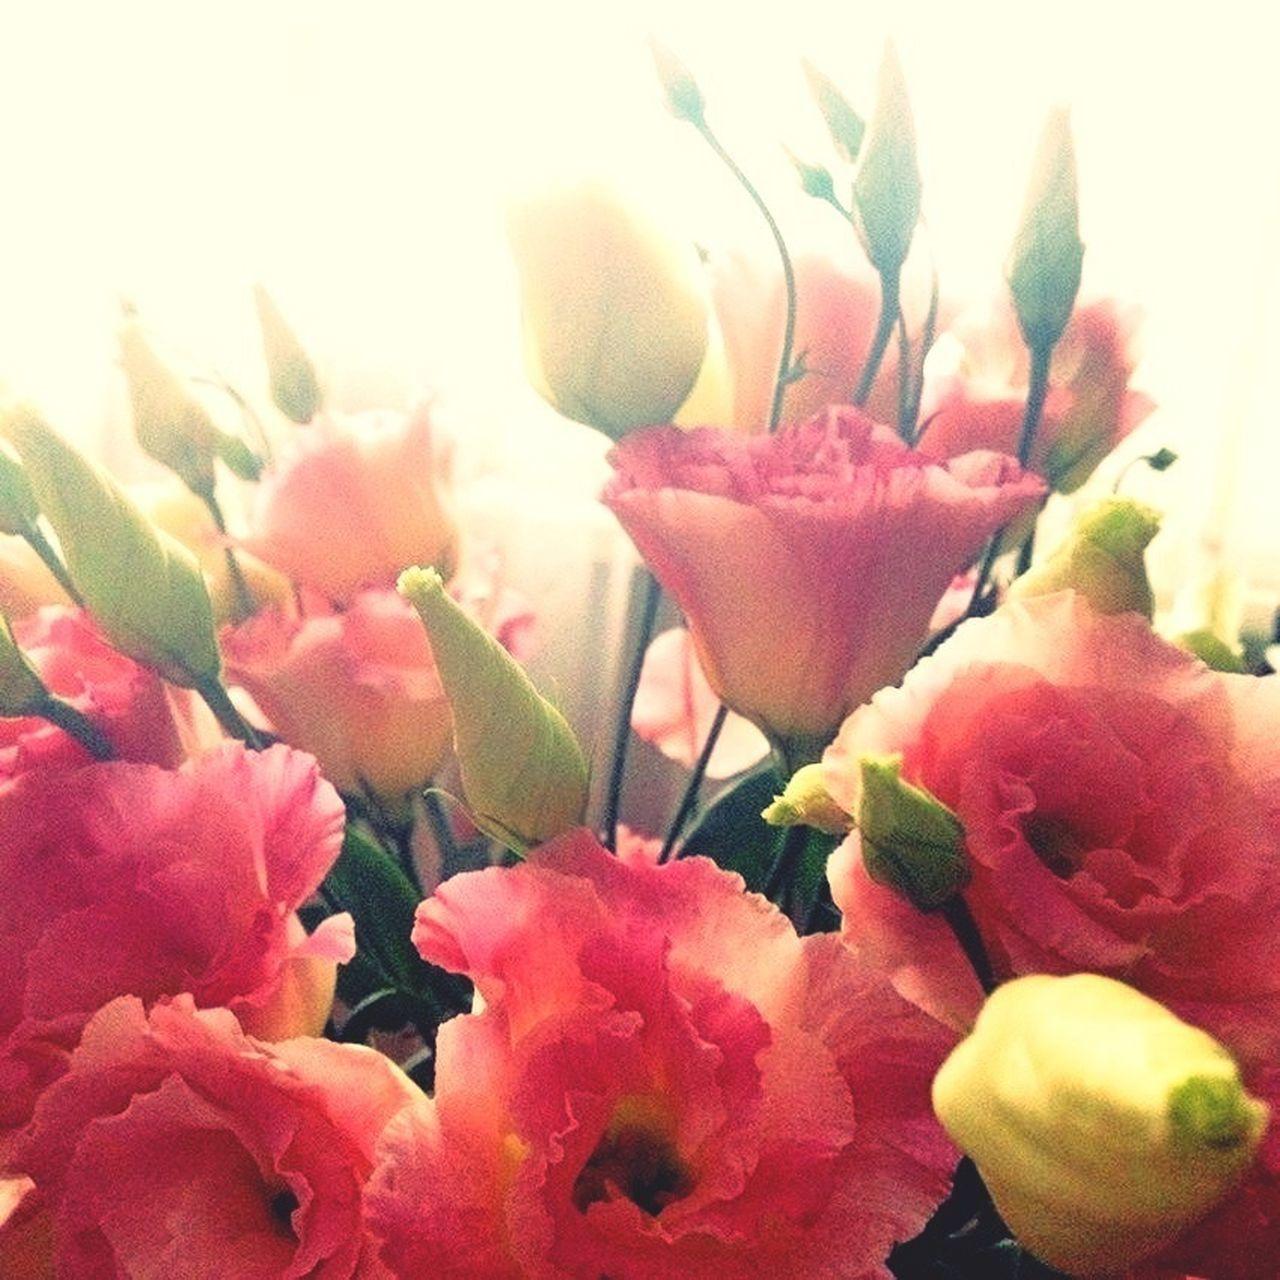 Flowers At Home EyeEm Best Shots Lisianthus Eustoma Millennial Pink